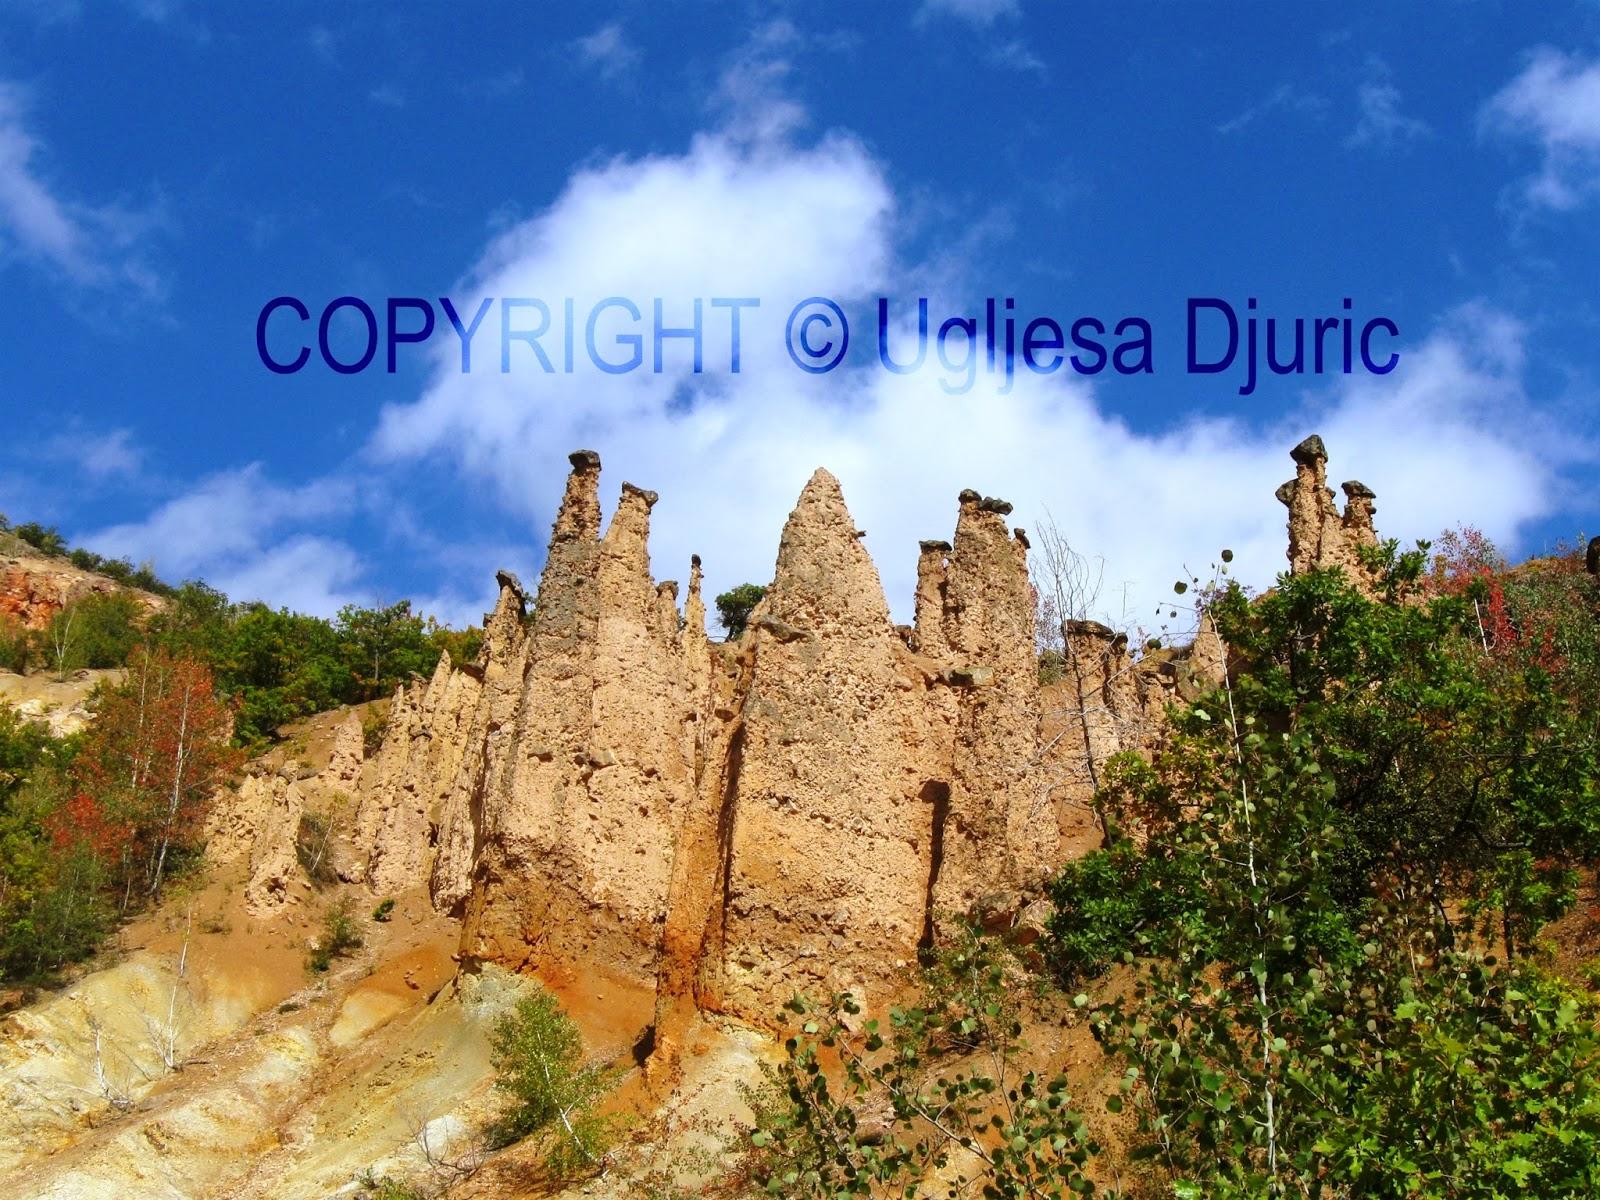 Ugljesa Djuric Photography: The Legend of Devil's Town